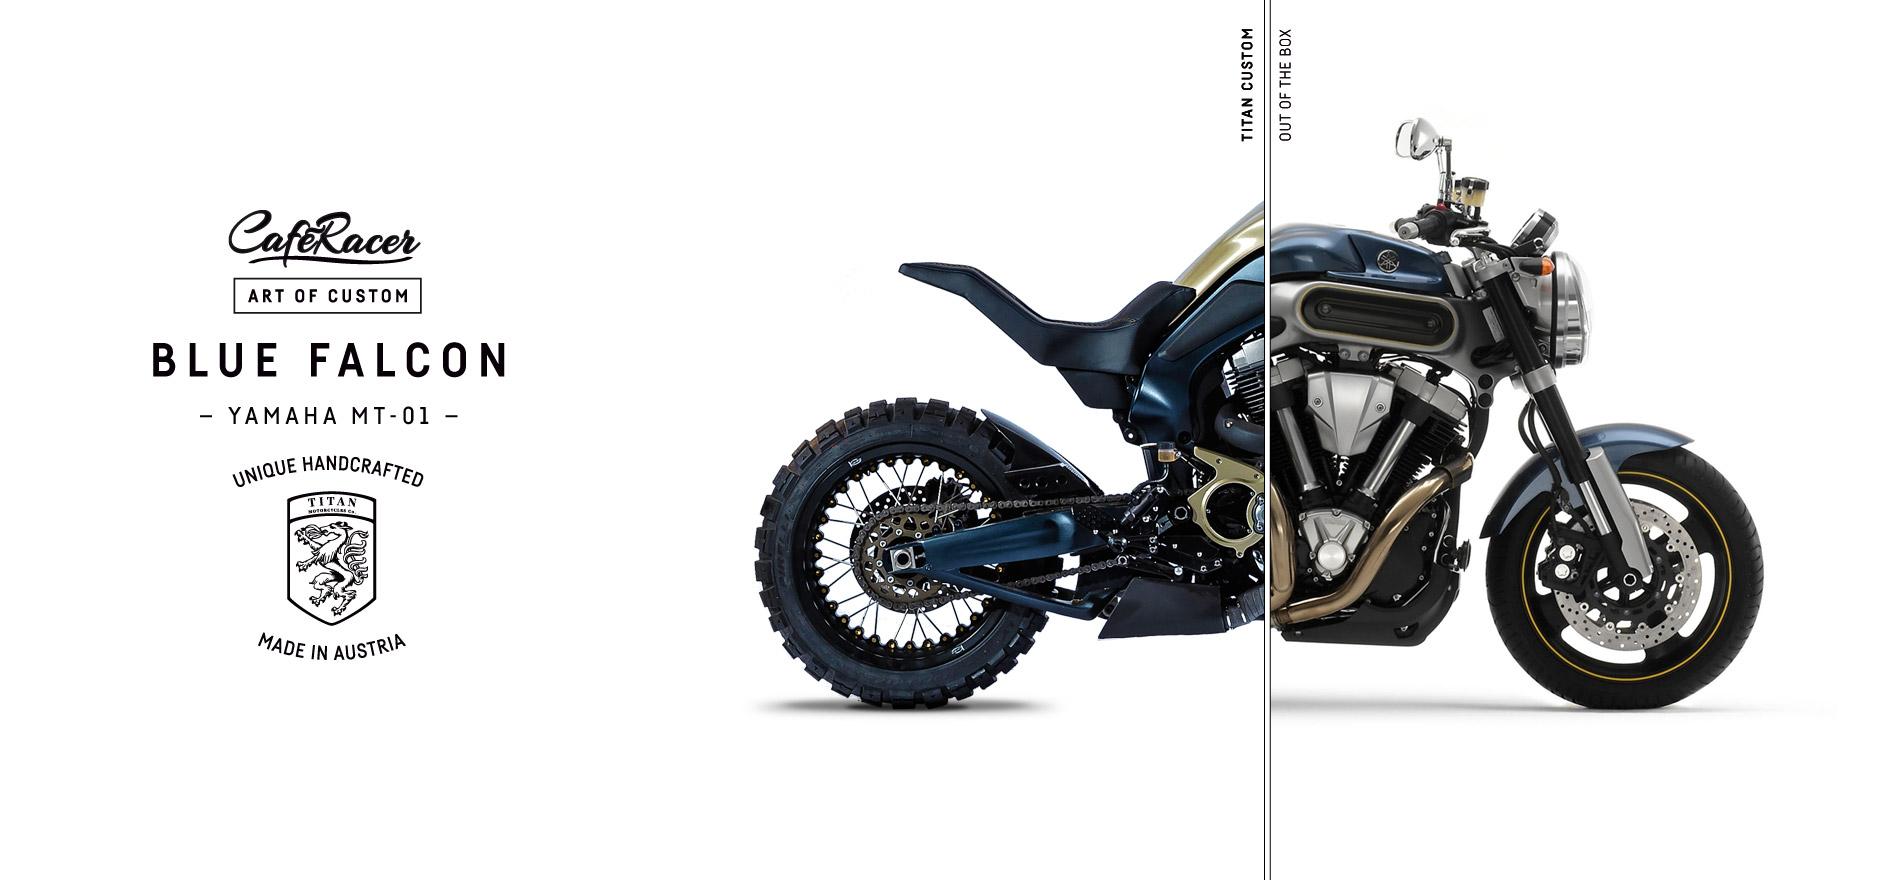 TITAN_CustomBike_CafeRacer_Graz_MadeInAustria_Before-After_Blue-Falcon_Yamaha-MT-01_Motorradumbau_Left